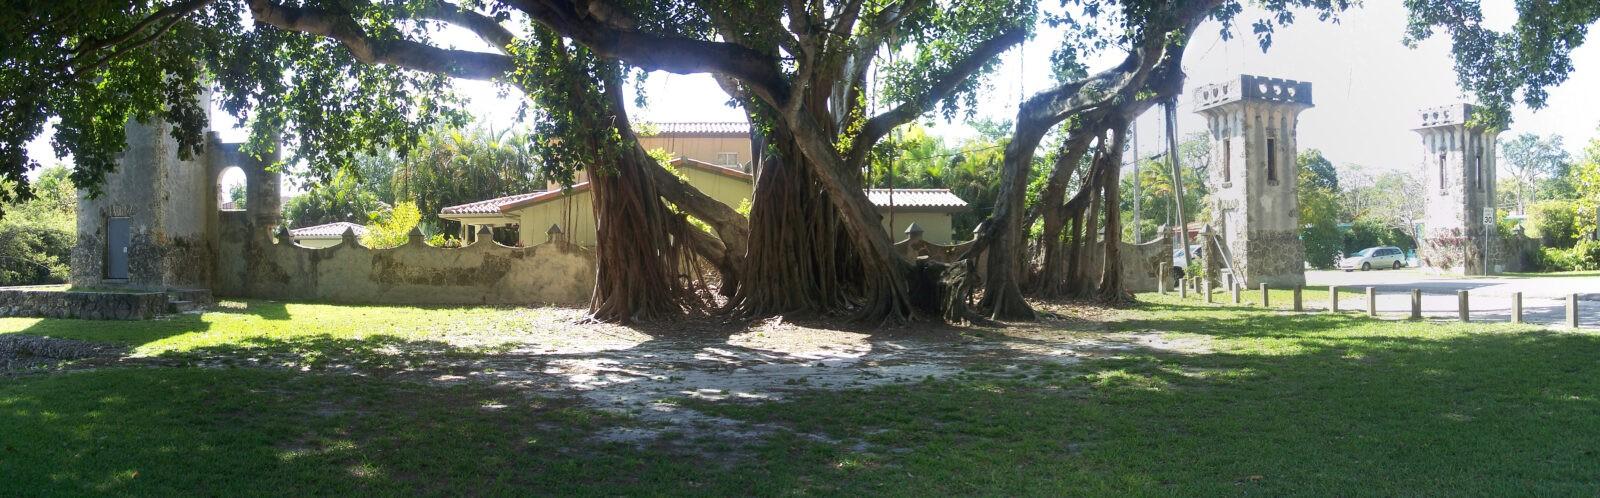 coral_gables_fl_entrance_to_central_miami_pano01